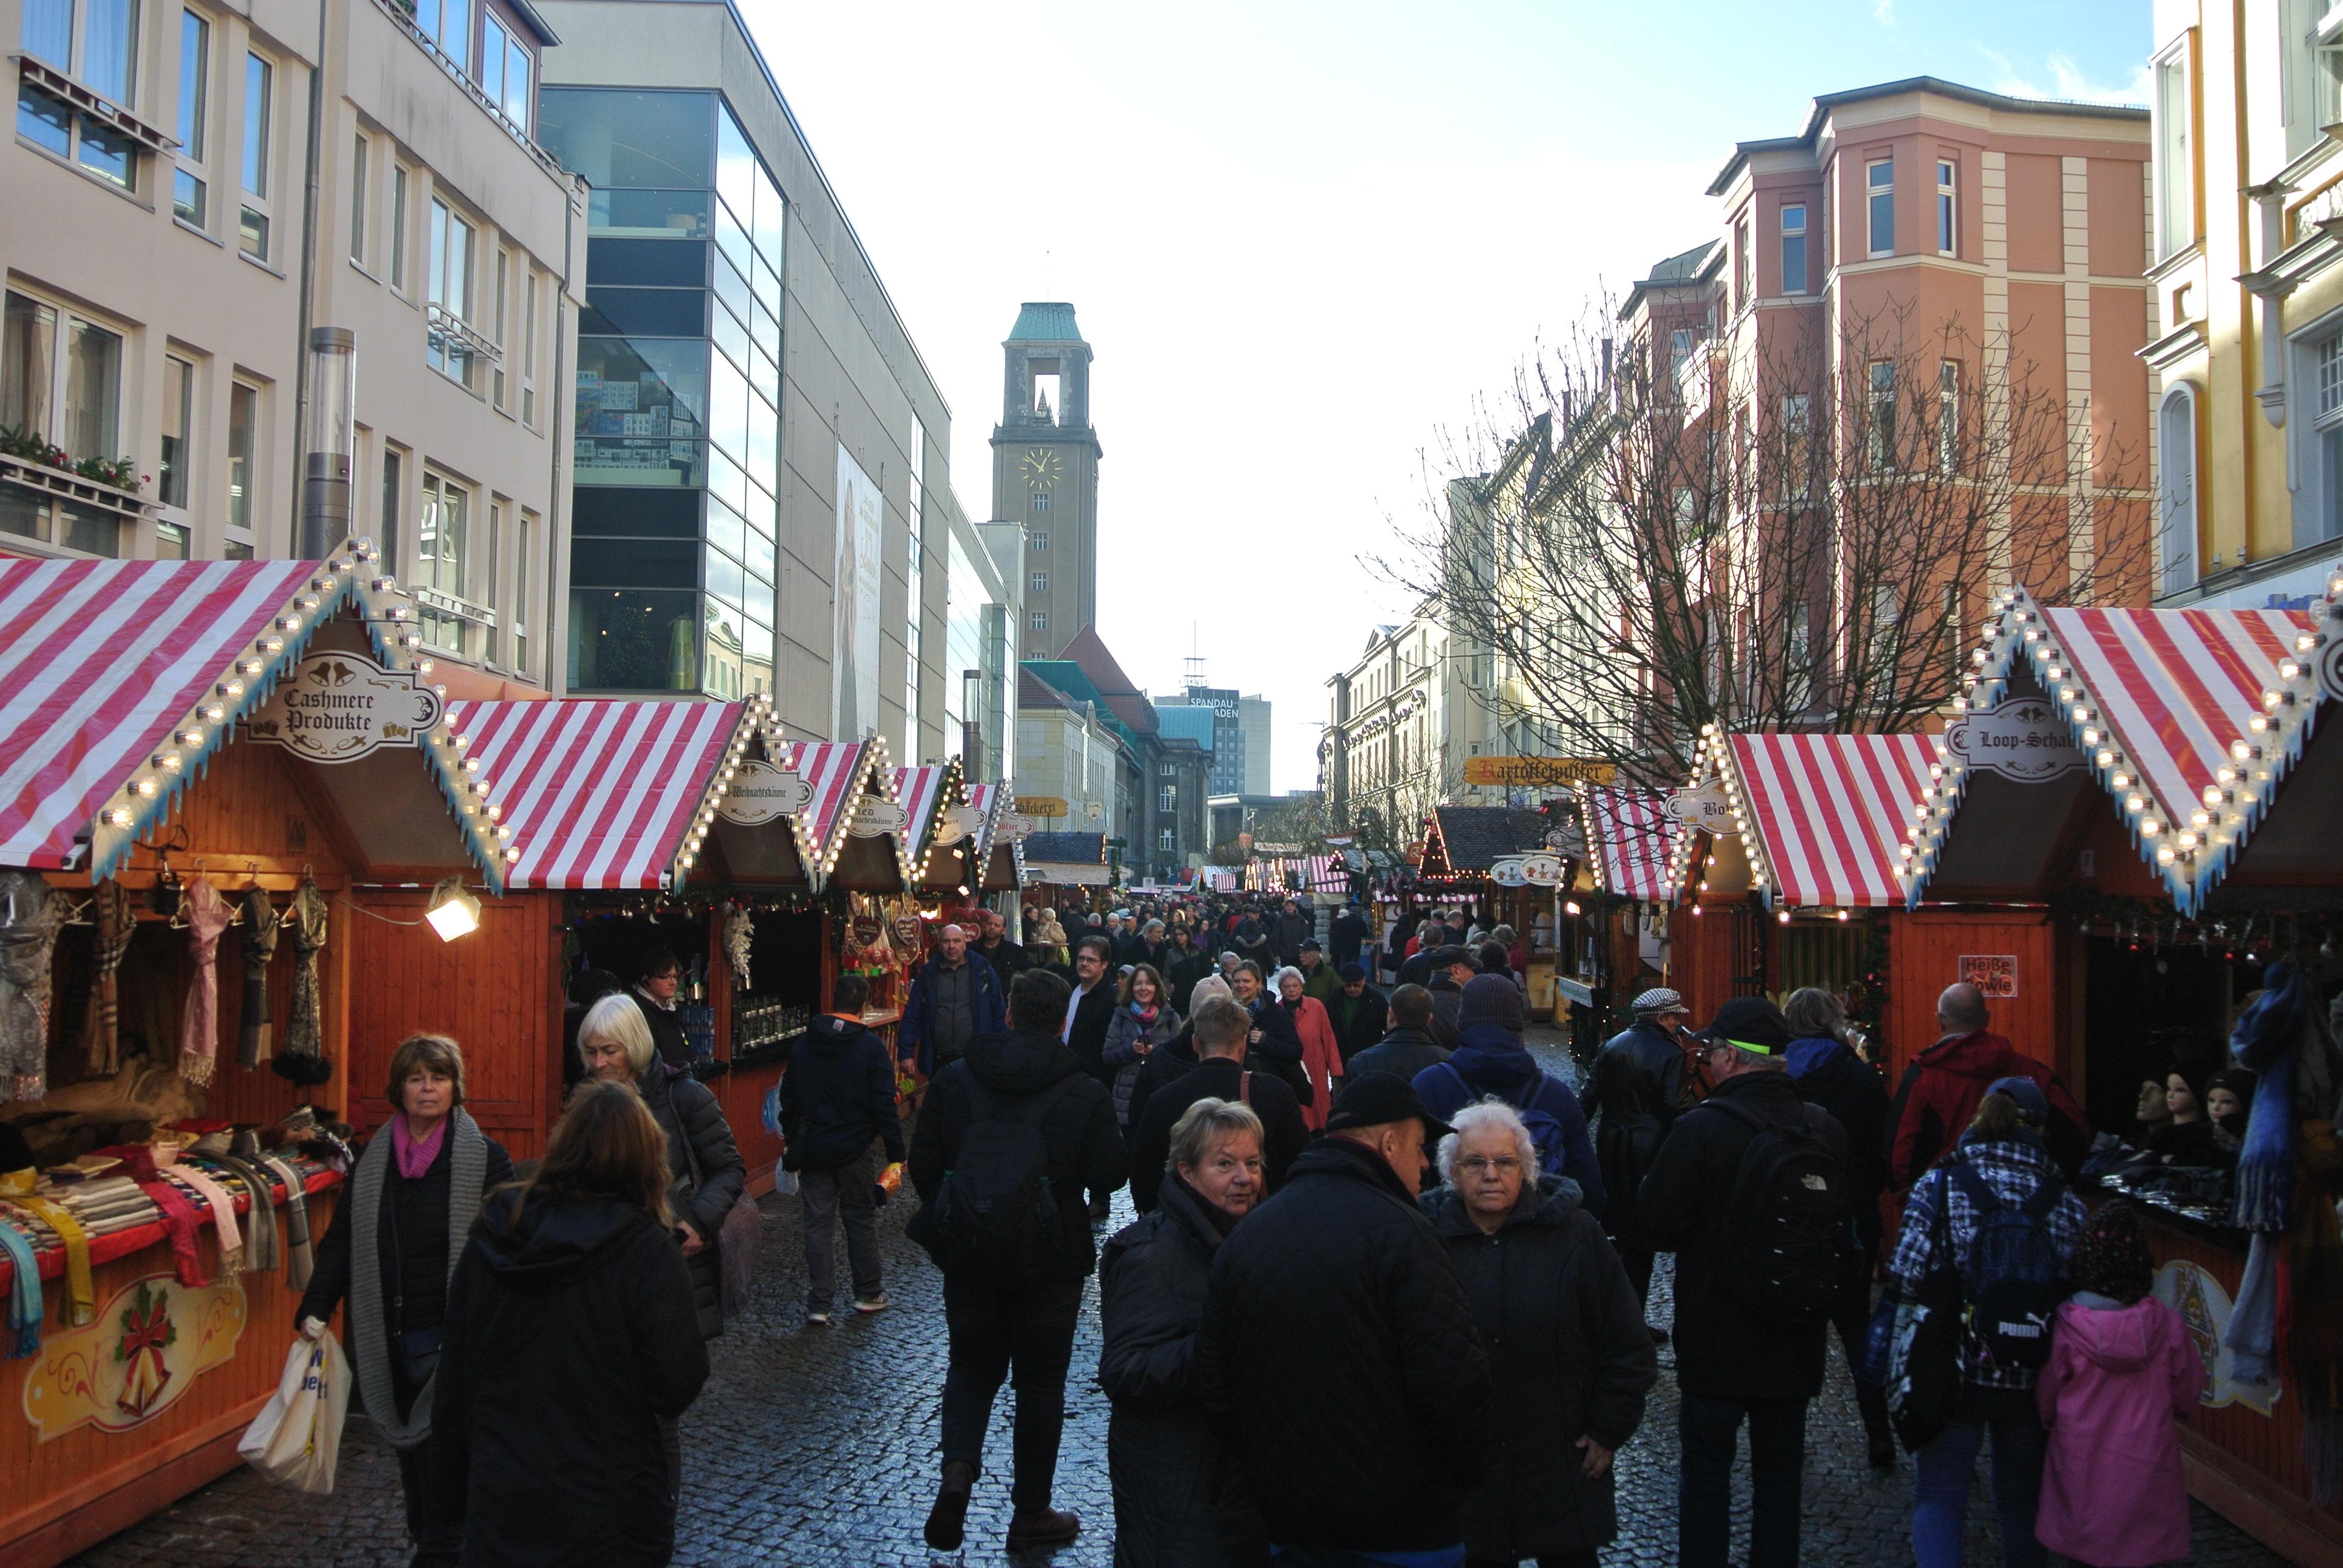 German Christmas Market in Daylight - photo by Juliamaud